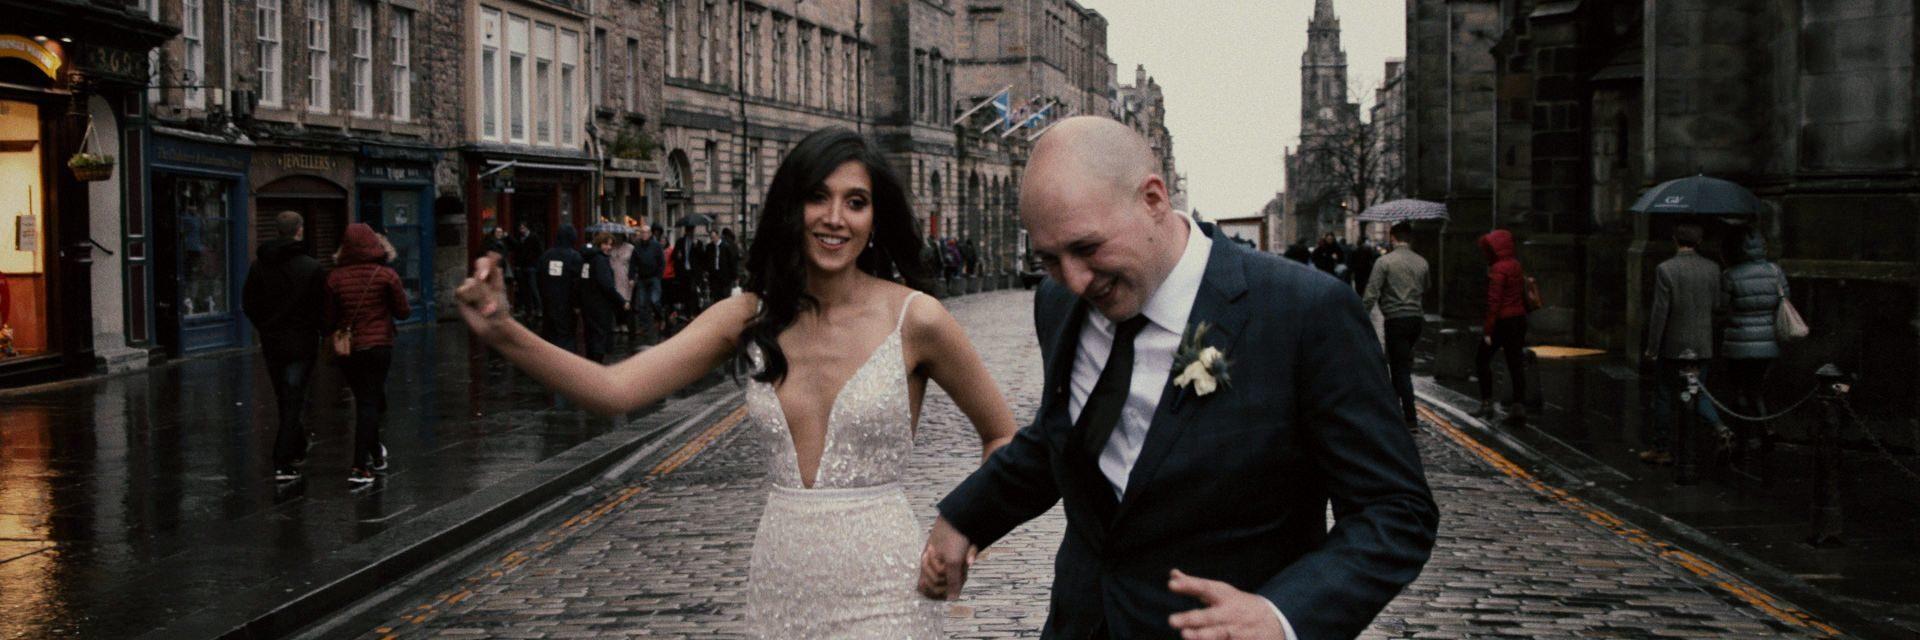 Firenze-wedding-videographer-cinemate-films-04